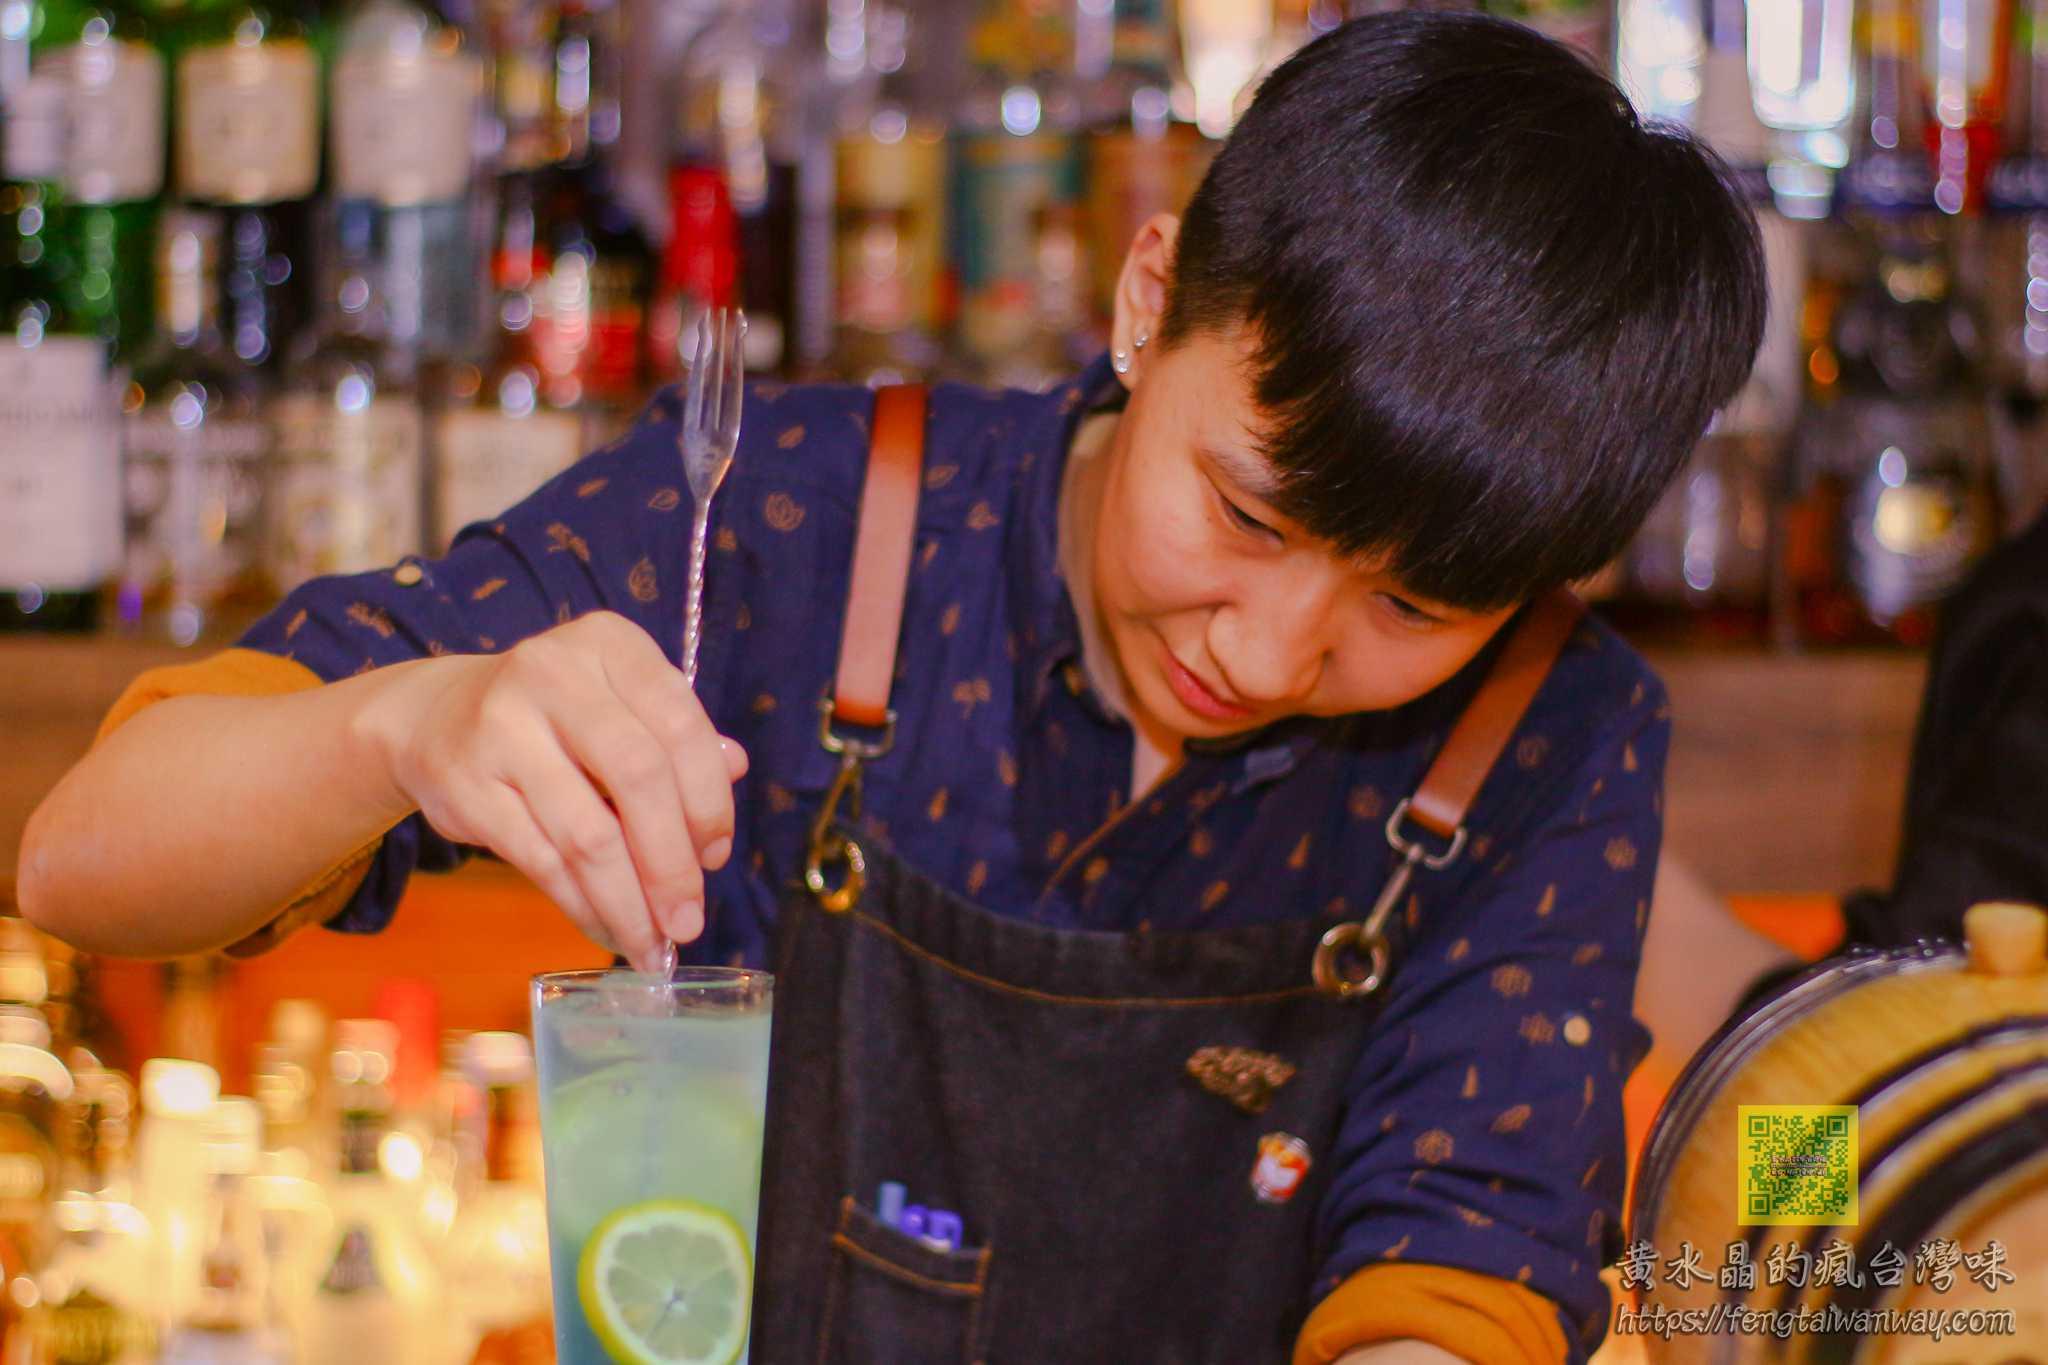 Mix Bistro餐酒館【桃園酒吧】|網美IG熱門打卡客製化調酒,職人調酒師的夏日微醺專業TIKI調酒 @黃水晶的瘋台灣味